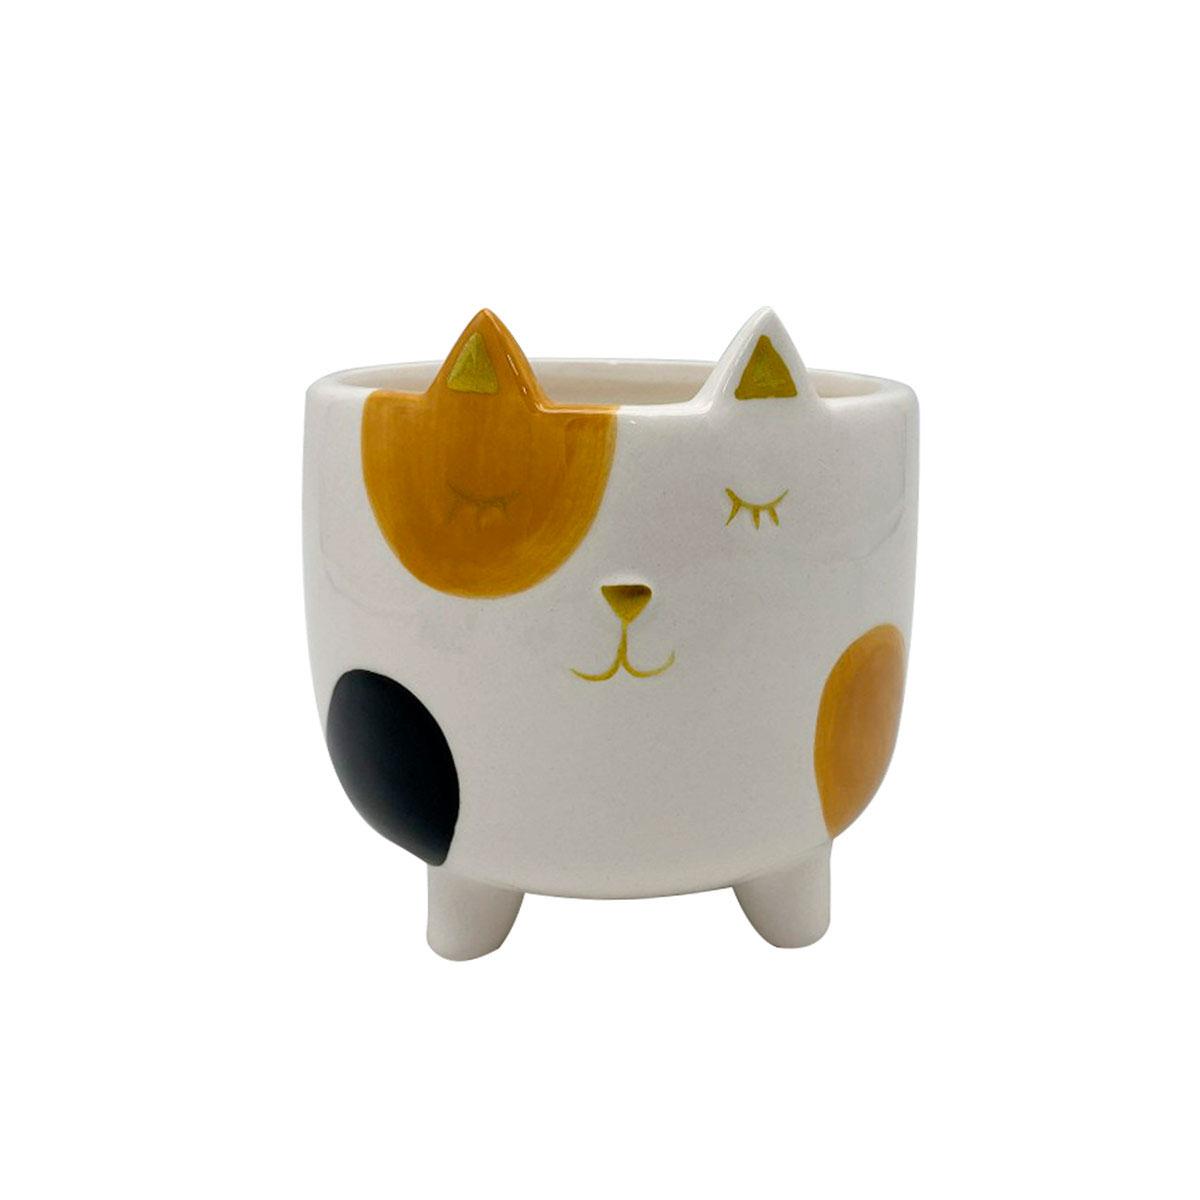 Cachepot Vaso Decorativo de Cerâmica Gato Malhado Grande - Presente Super